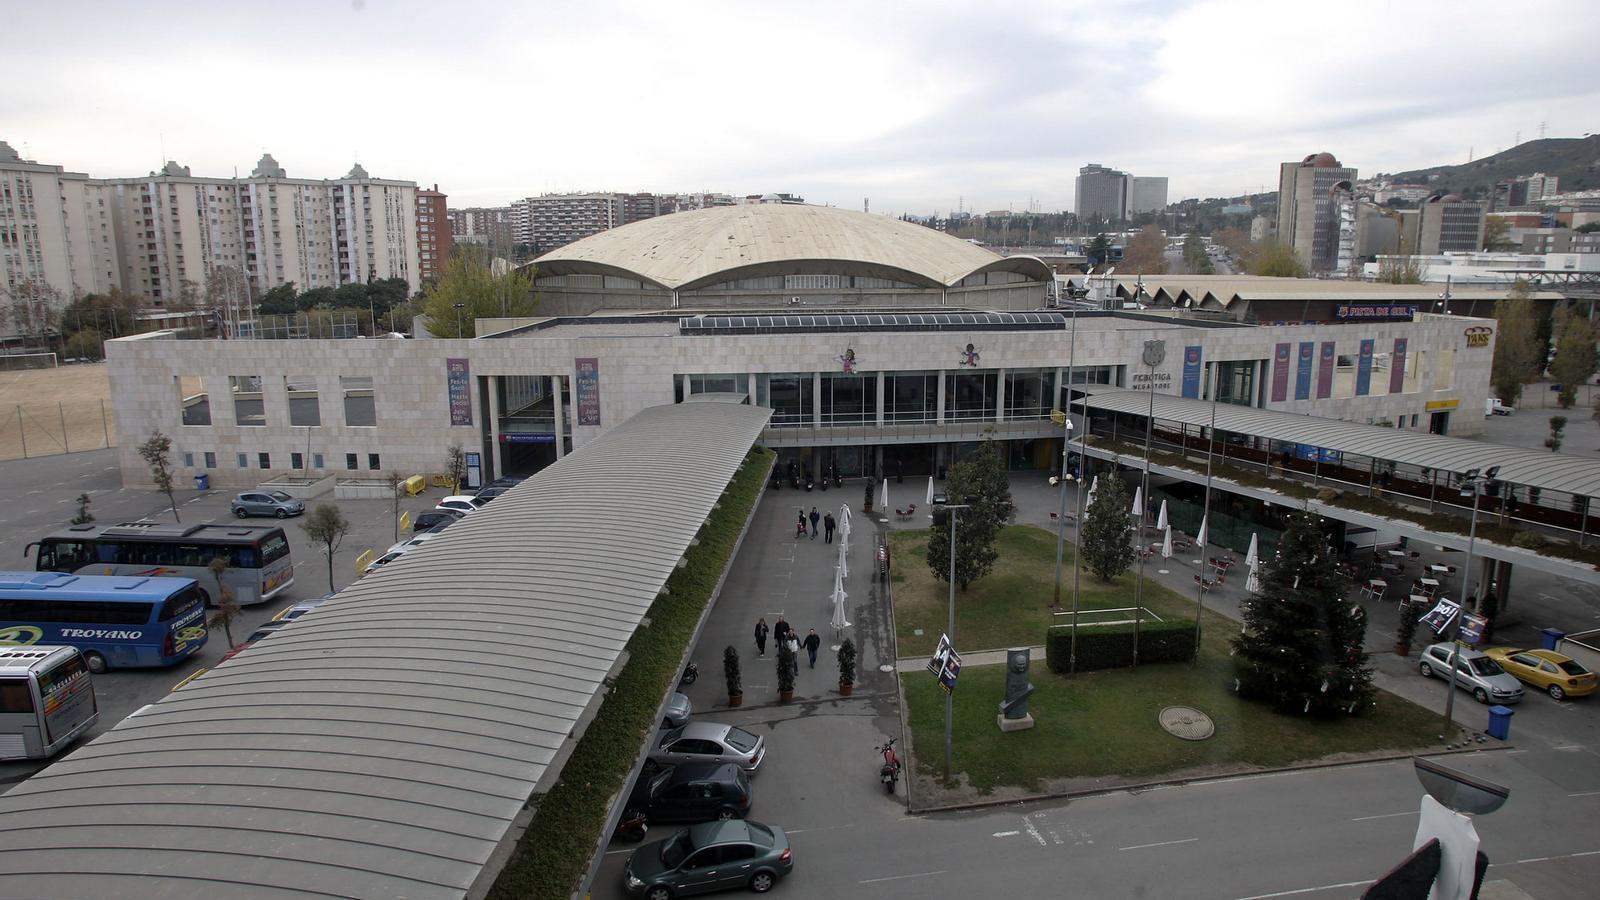 El projecte per substituir el palau blaugrana aparcat for Puerta 0 palau blaugrana